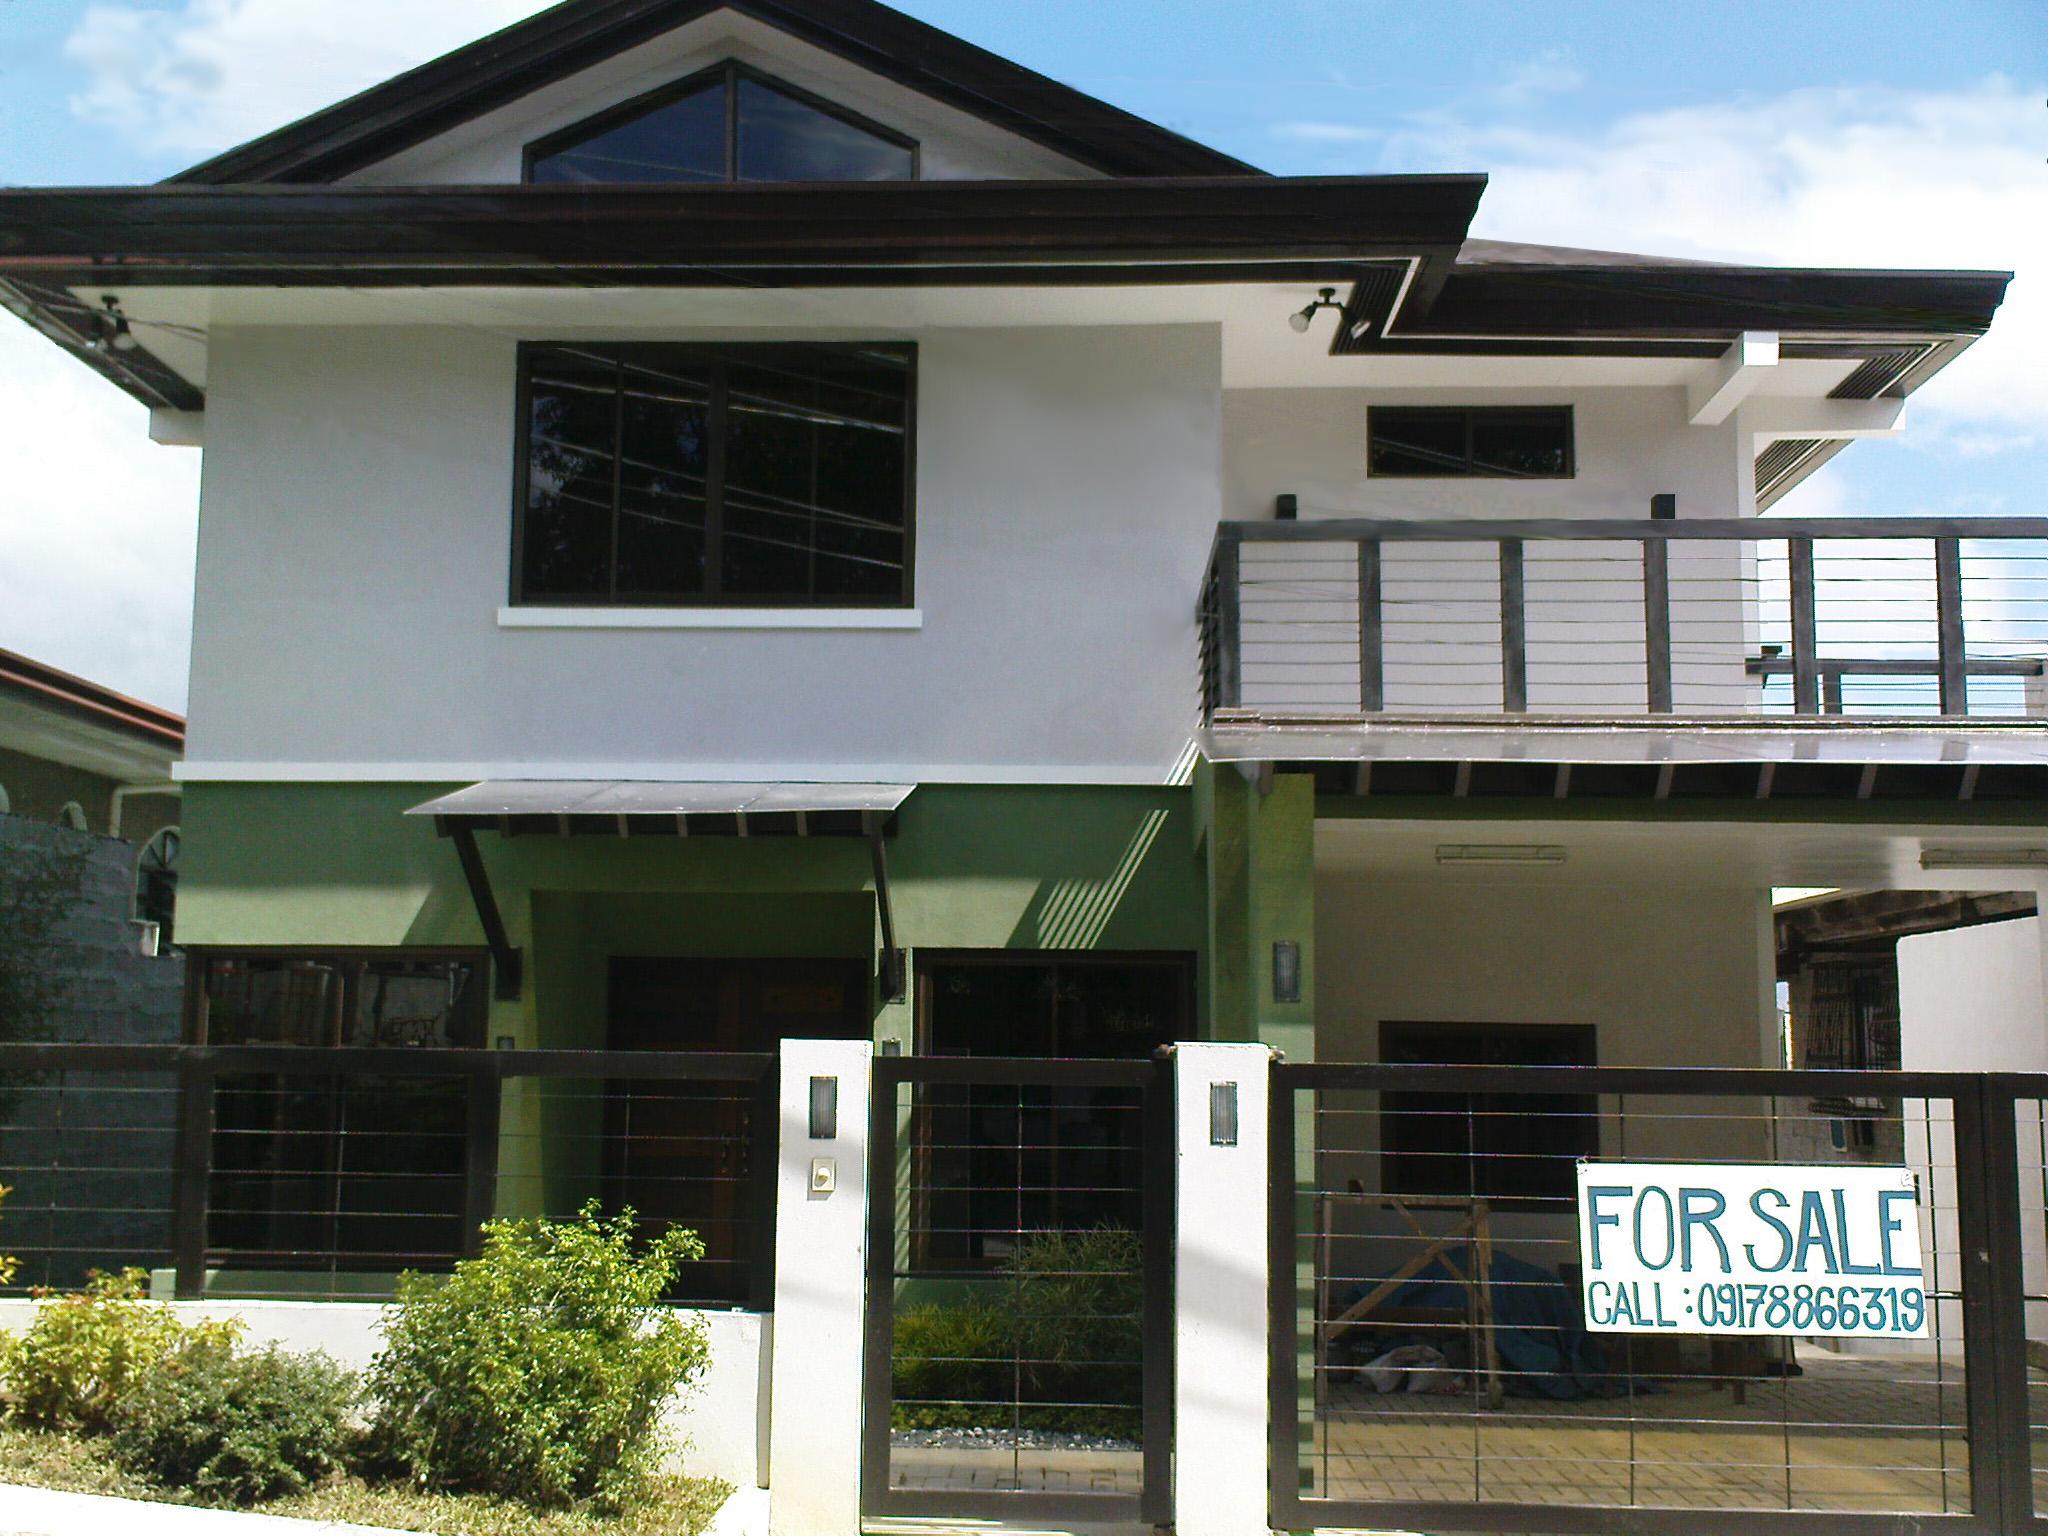 filinvest residence